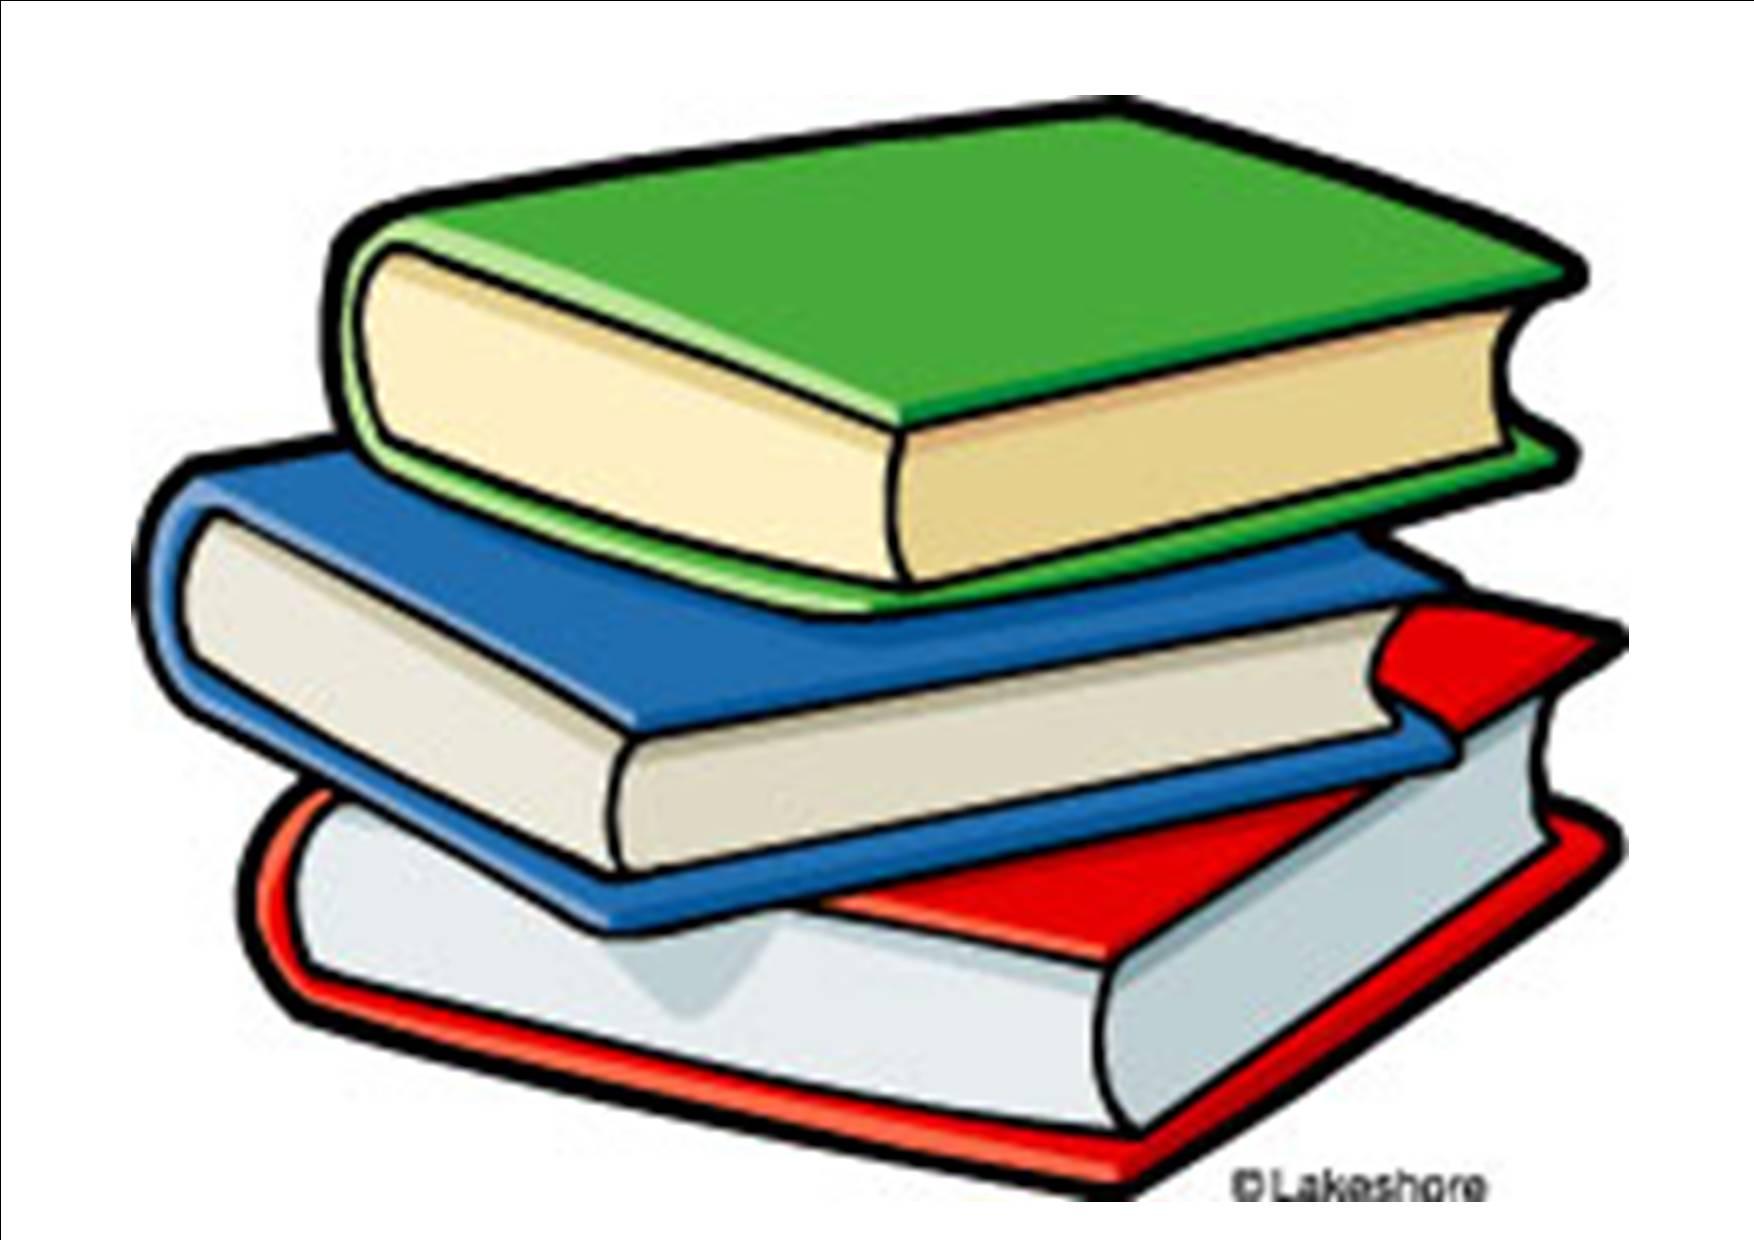 1754x1240 Clip Art Of A Book